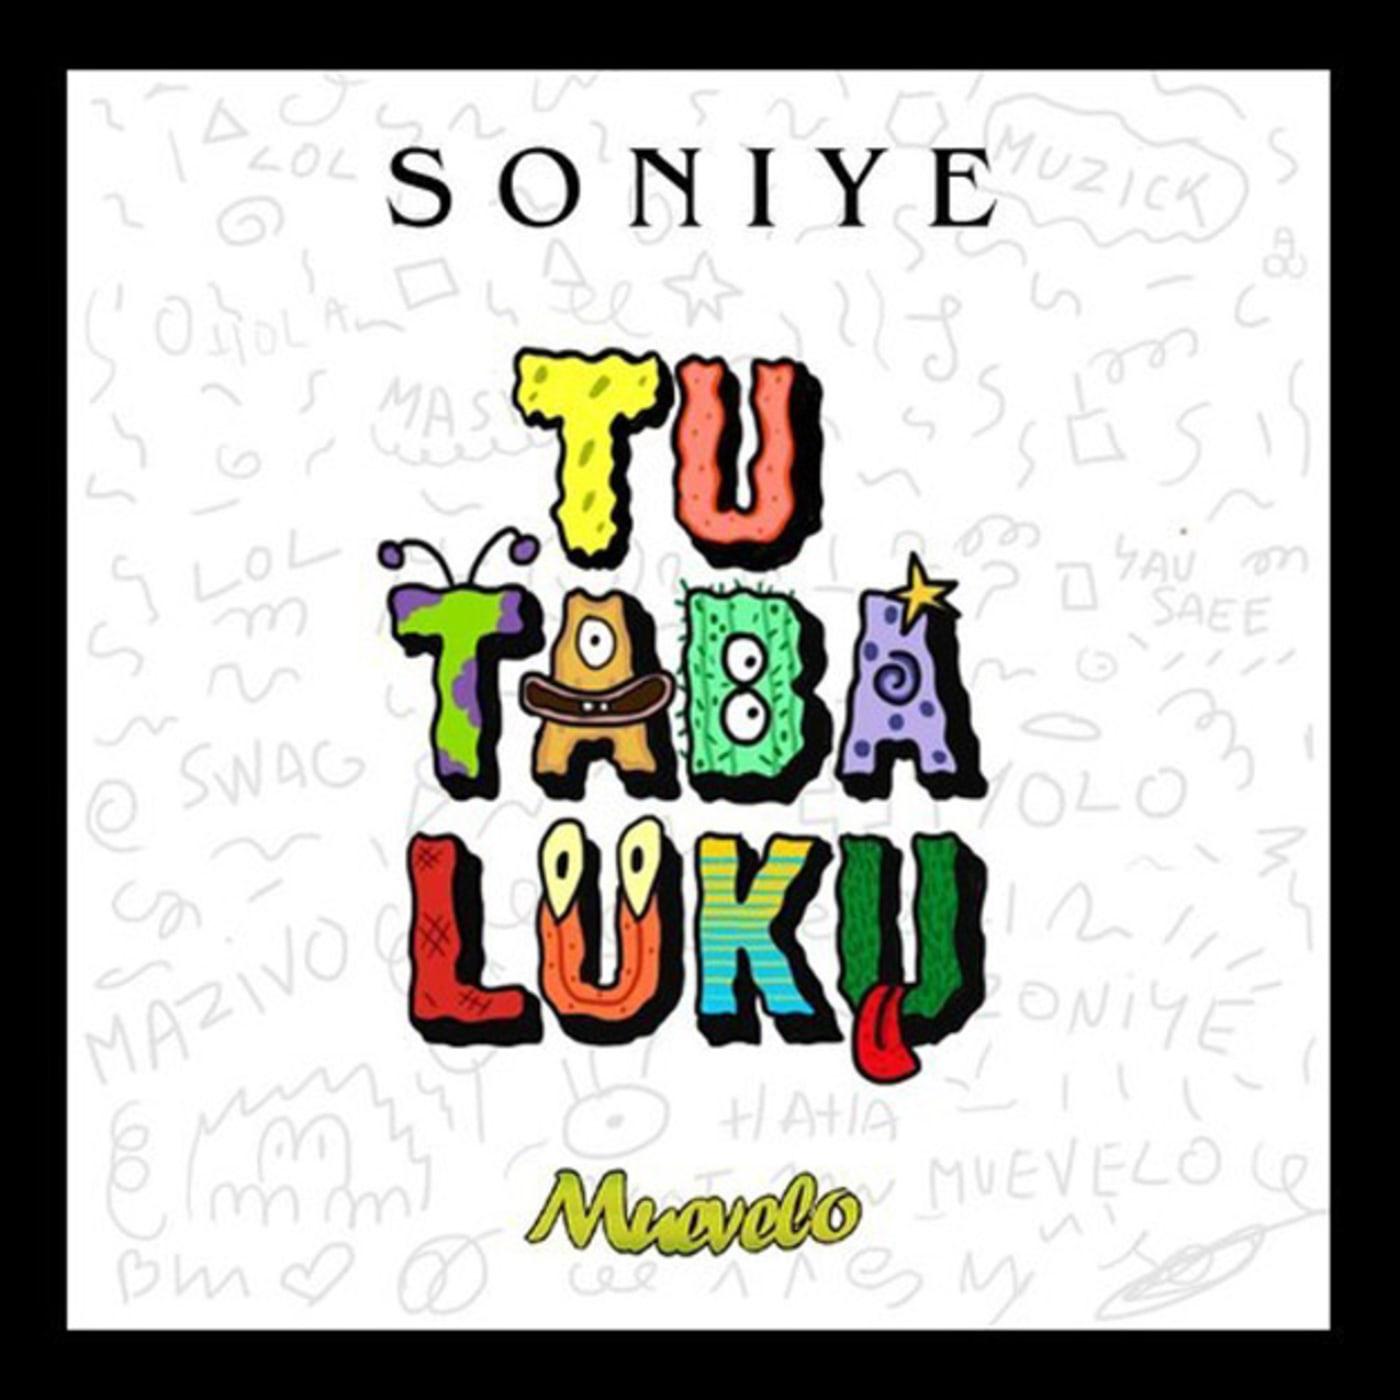 Soniye TuTabaLuku